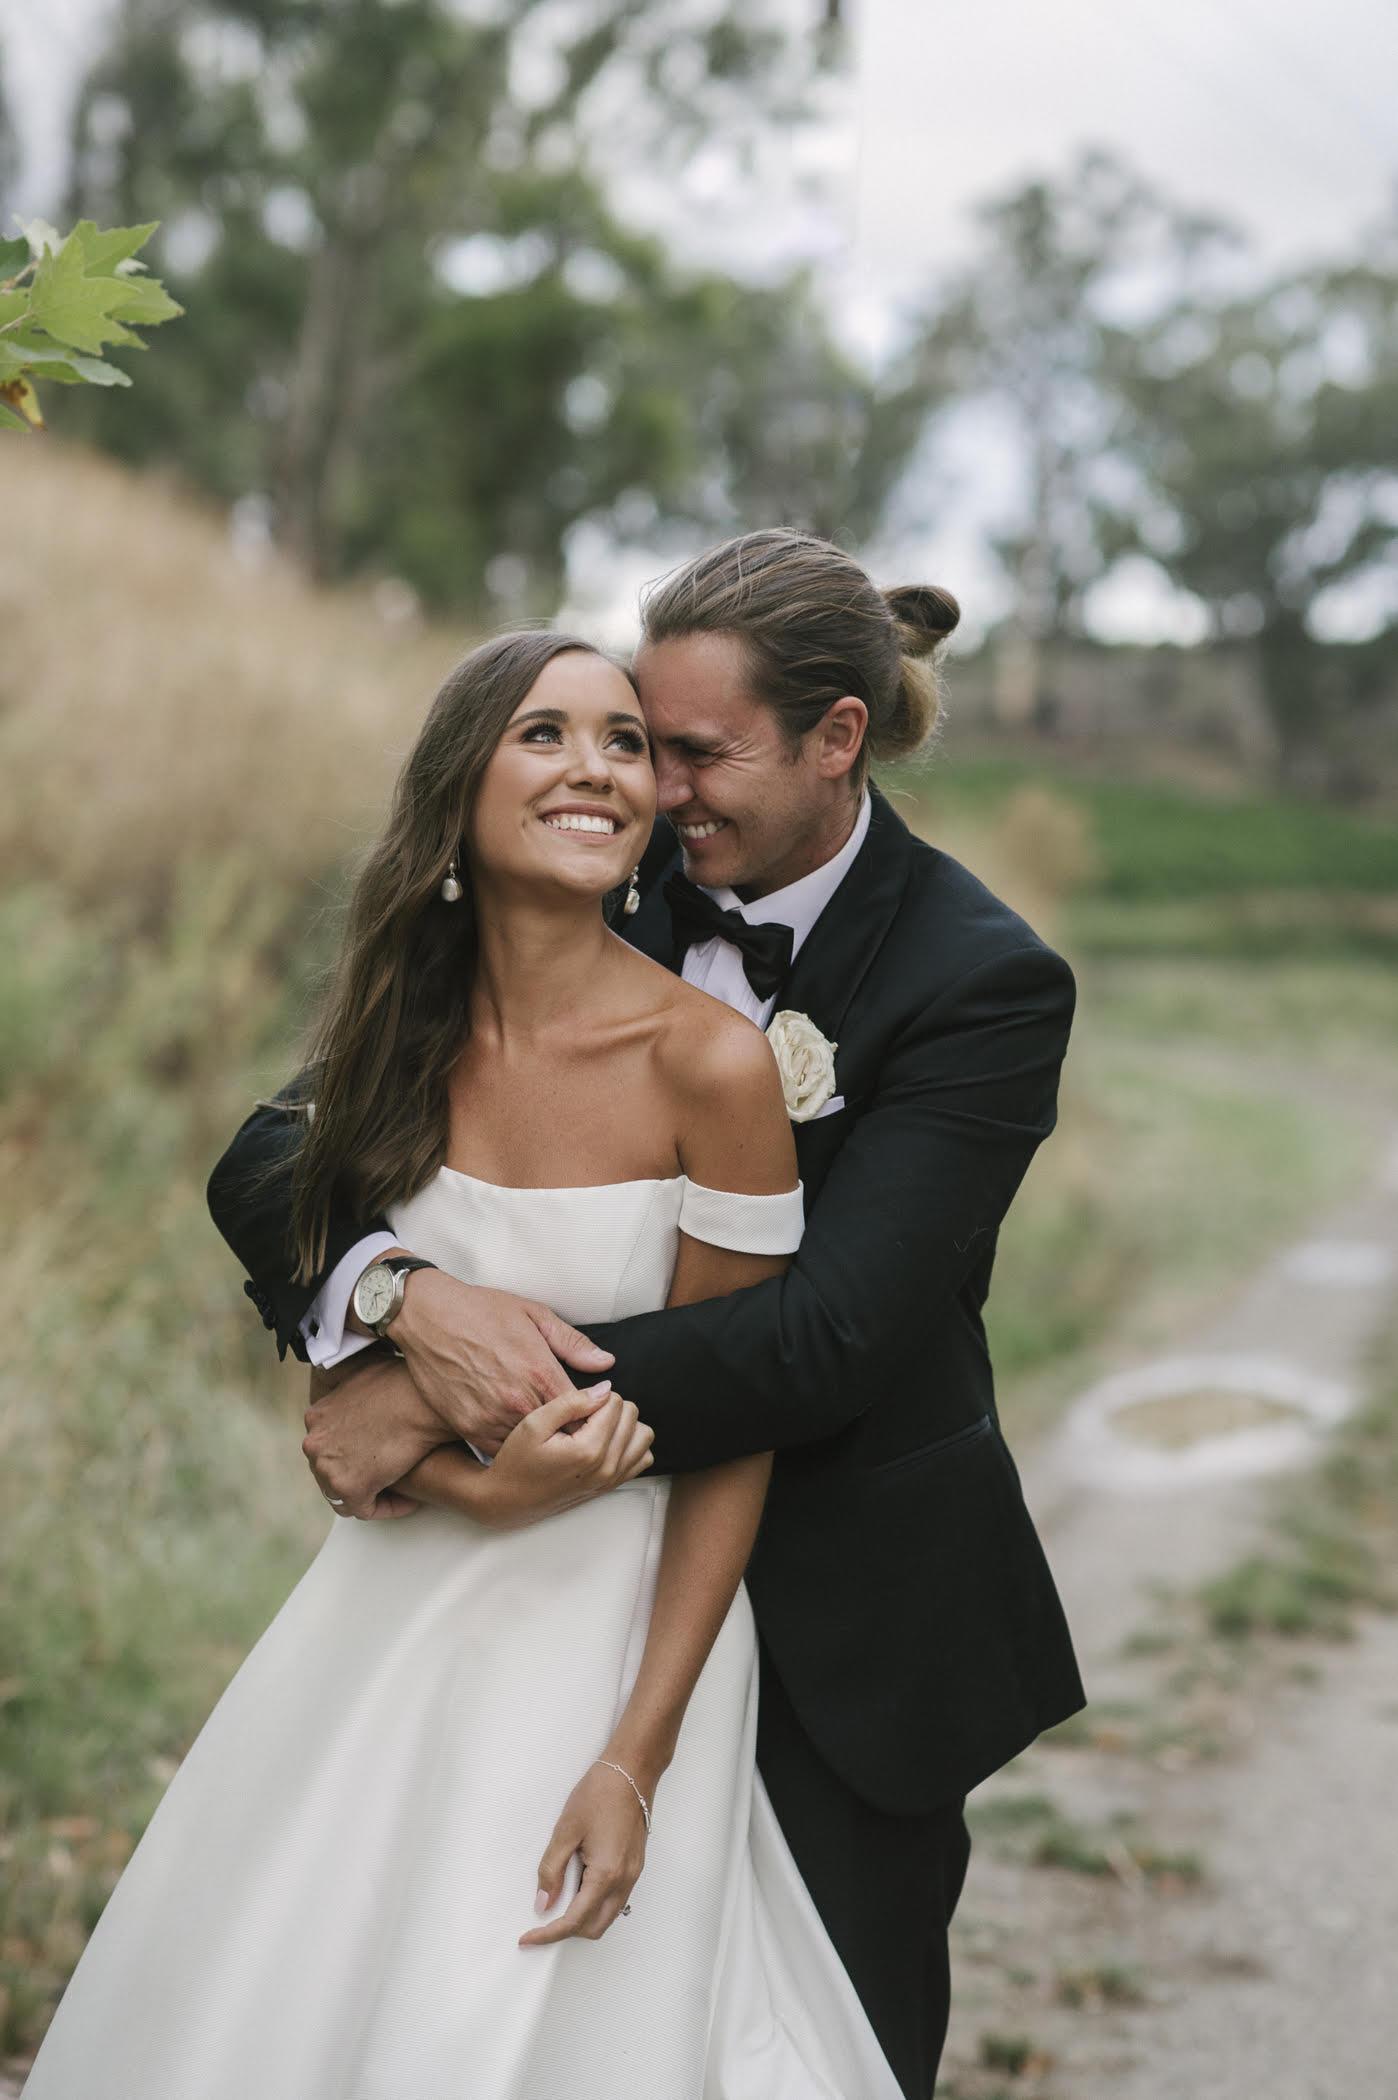 Hannah and Zak